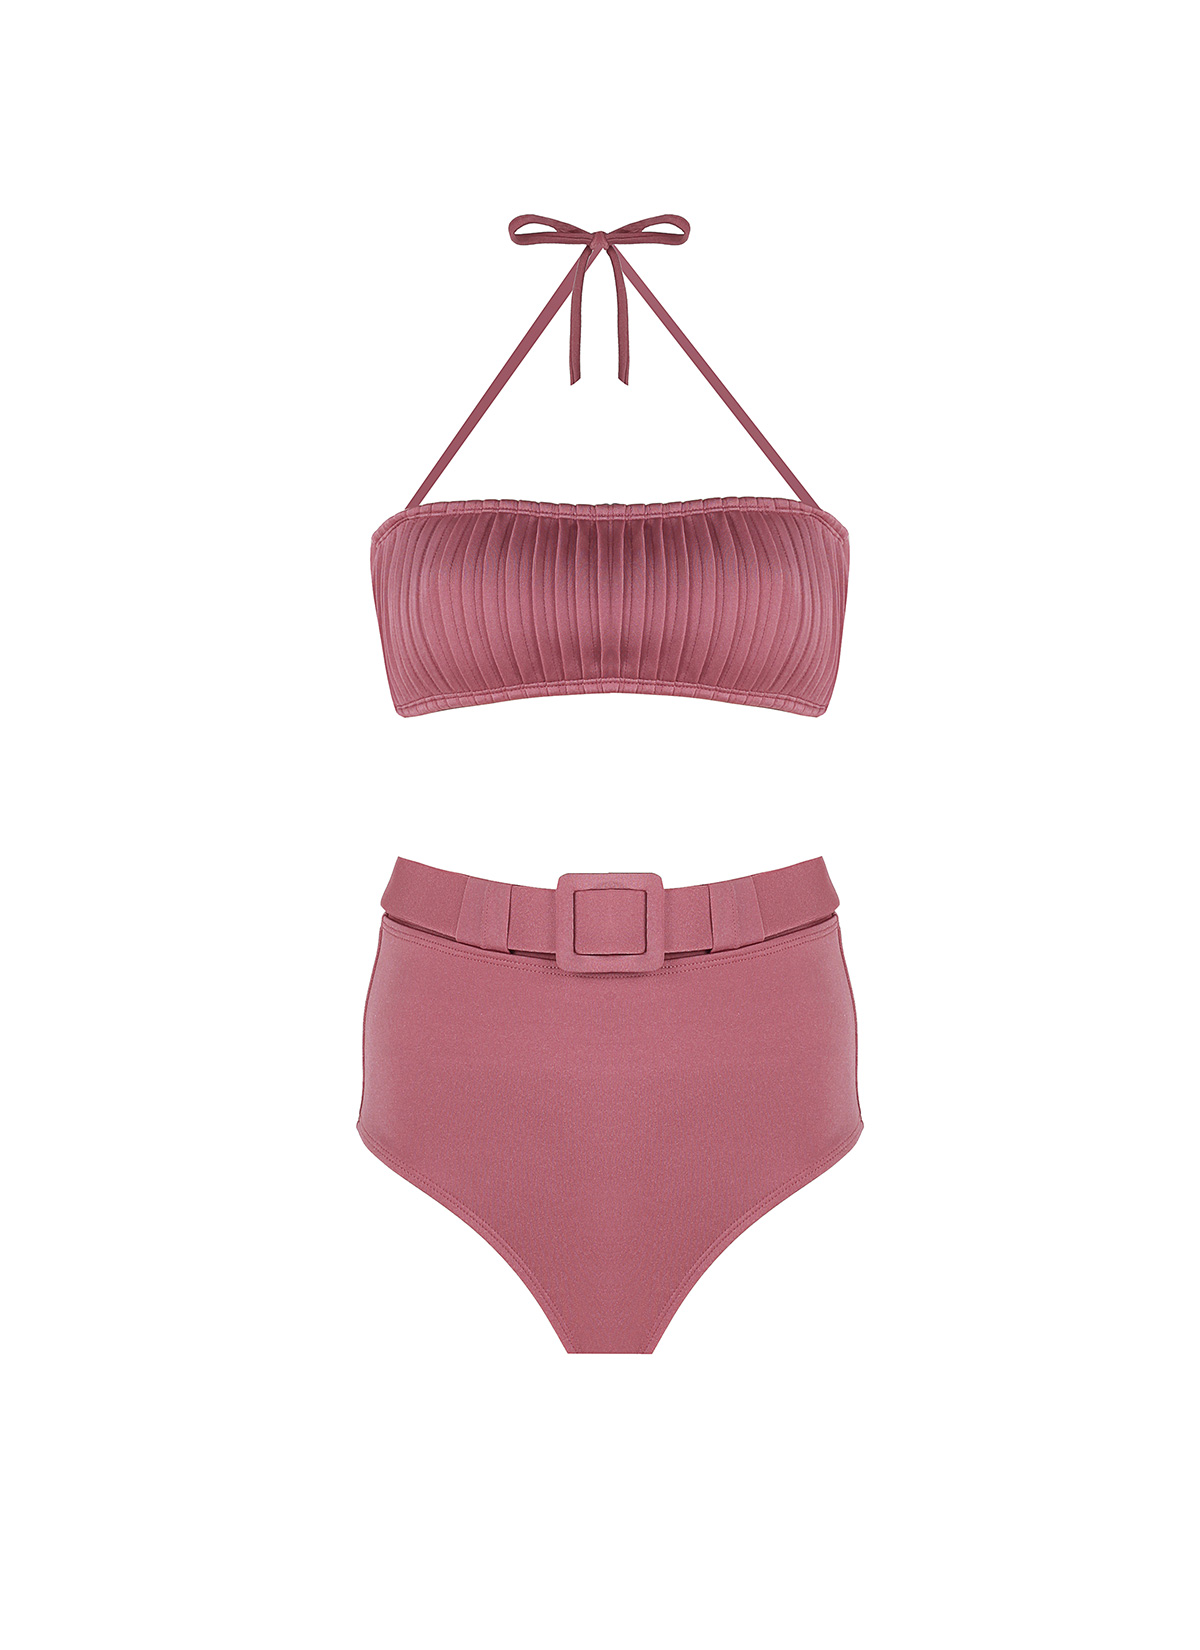 Linda Pembe Bikini Takımı